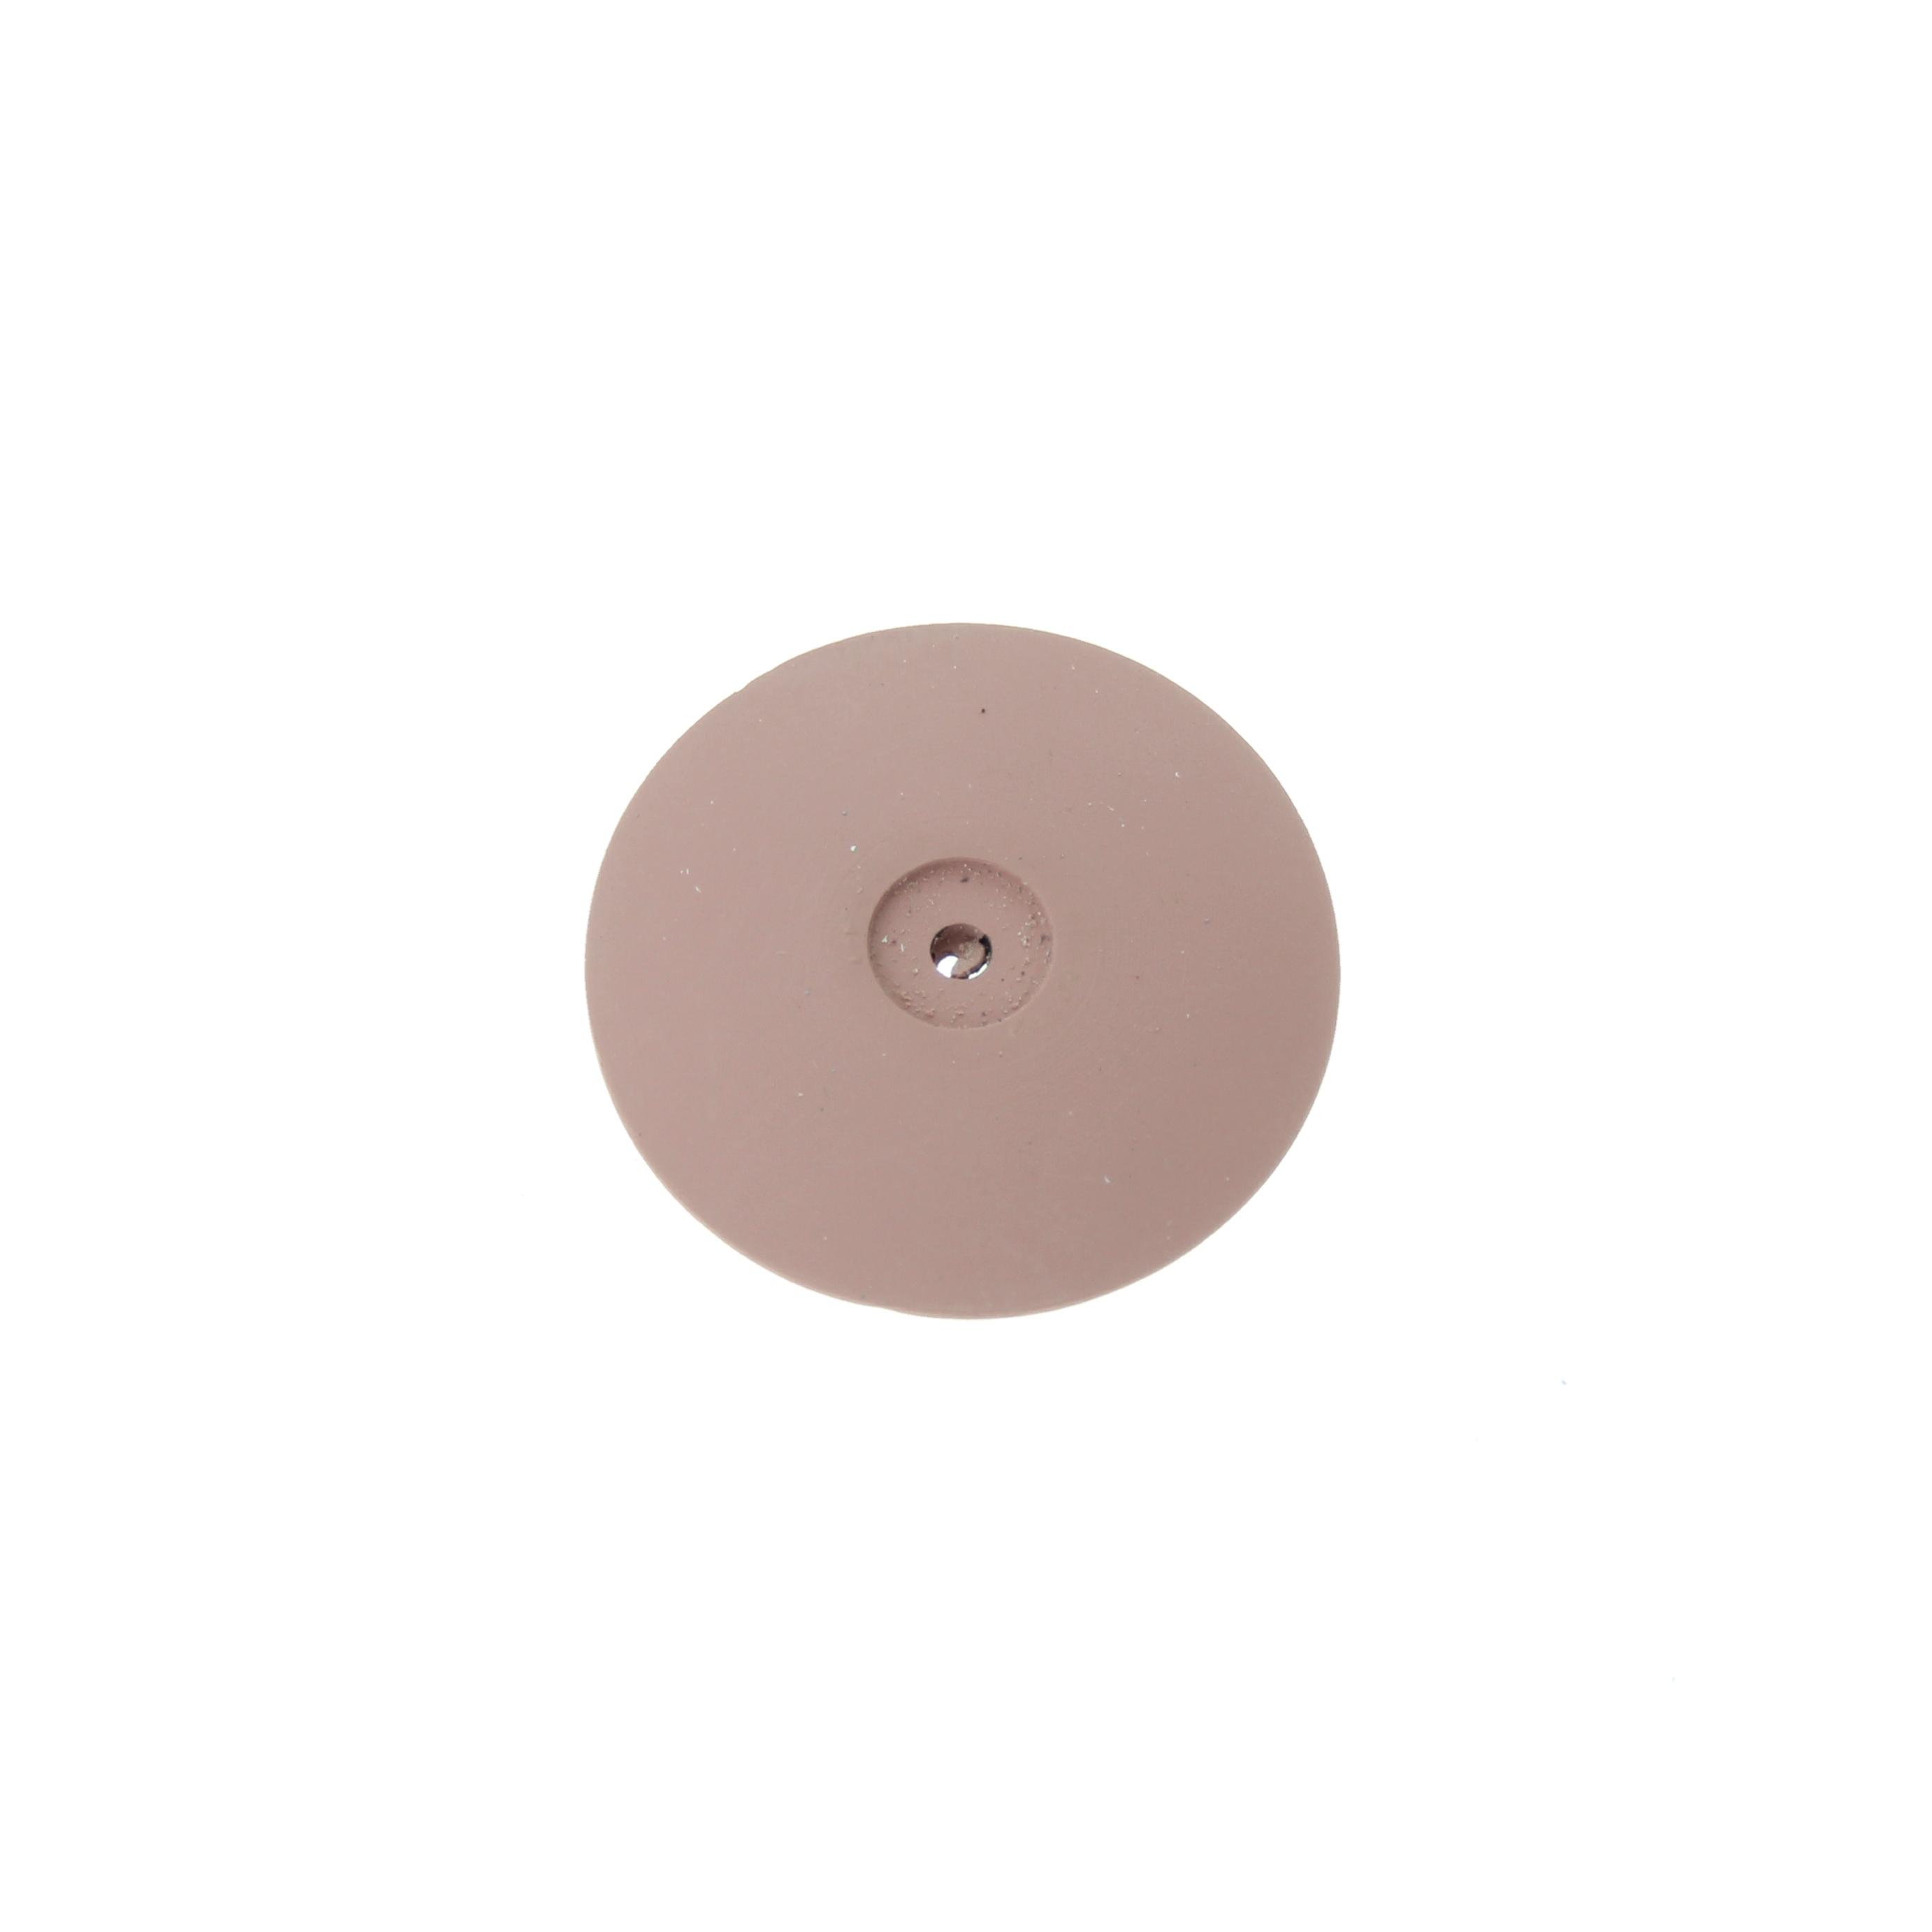 Резинка розовая б/д линза  22*4  Ls22sf